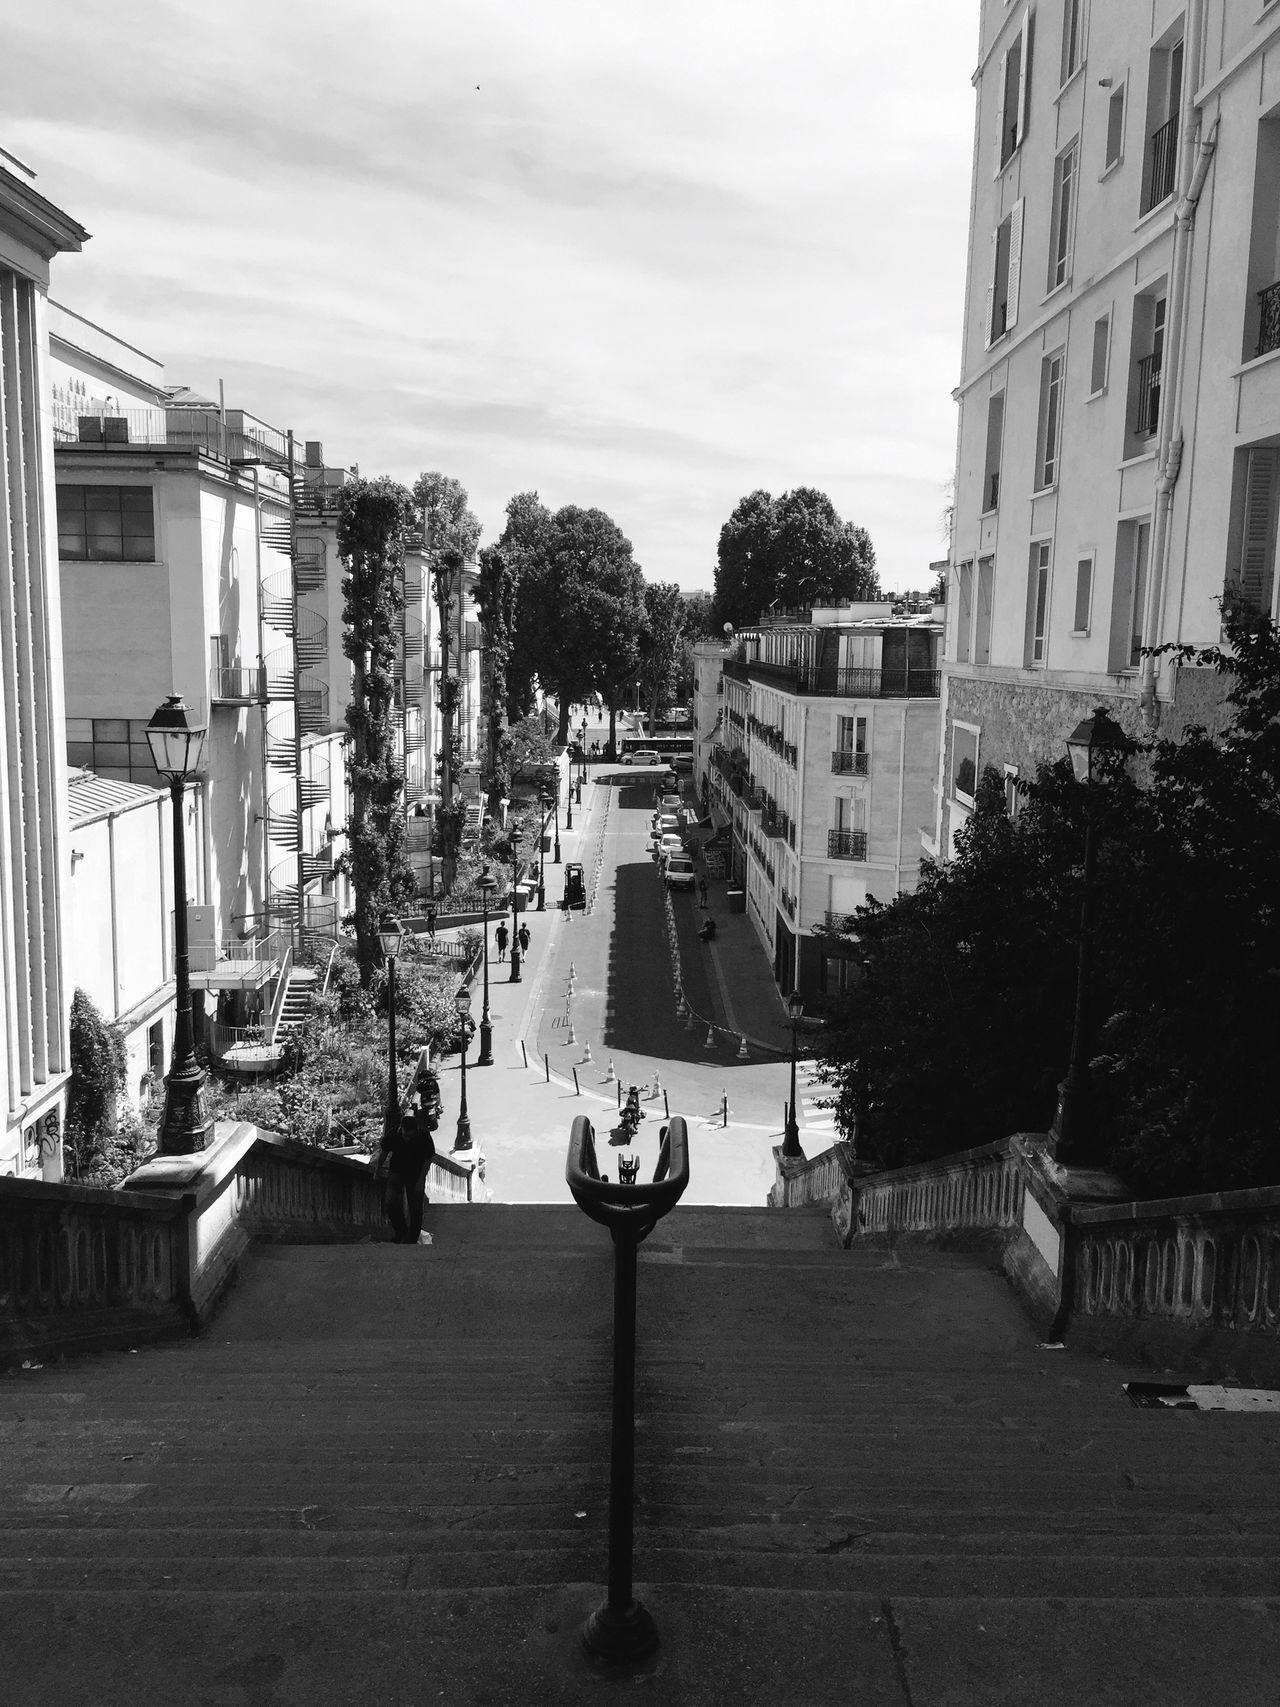 Cityscapes Architecture Street Photography Eye4photography  Paris Open Edit Streetphotography EyeEm Best Shots EyeEm Masterclass Black & White